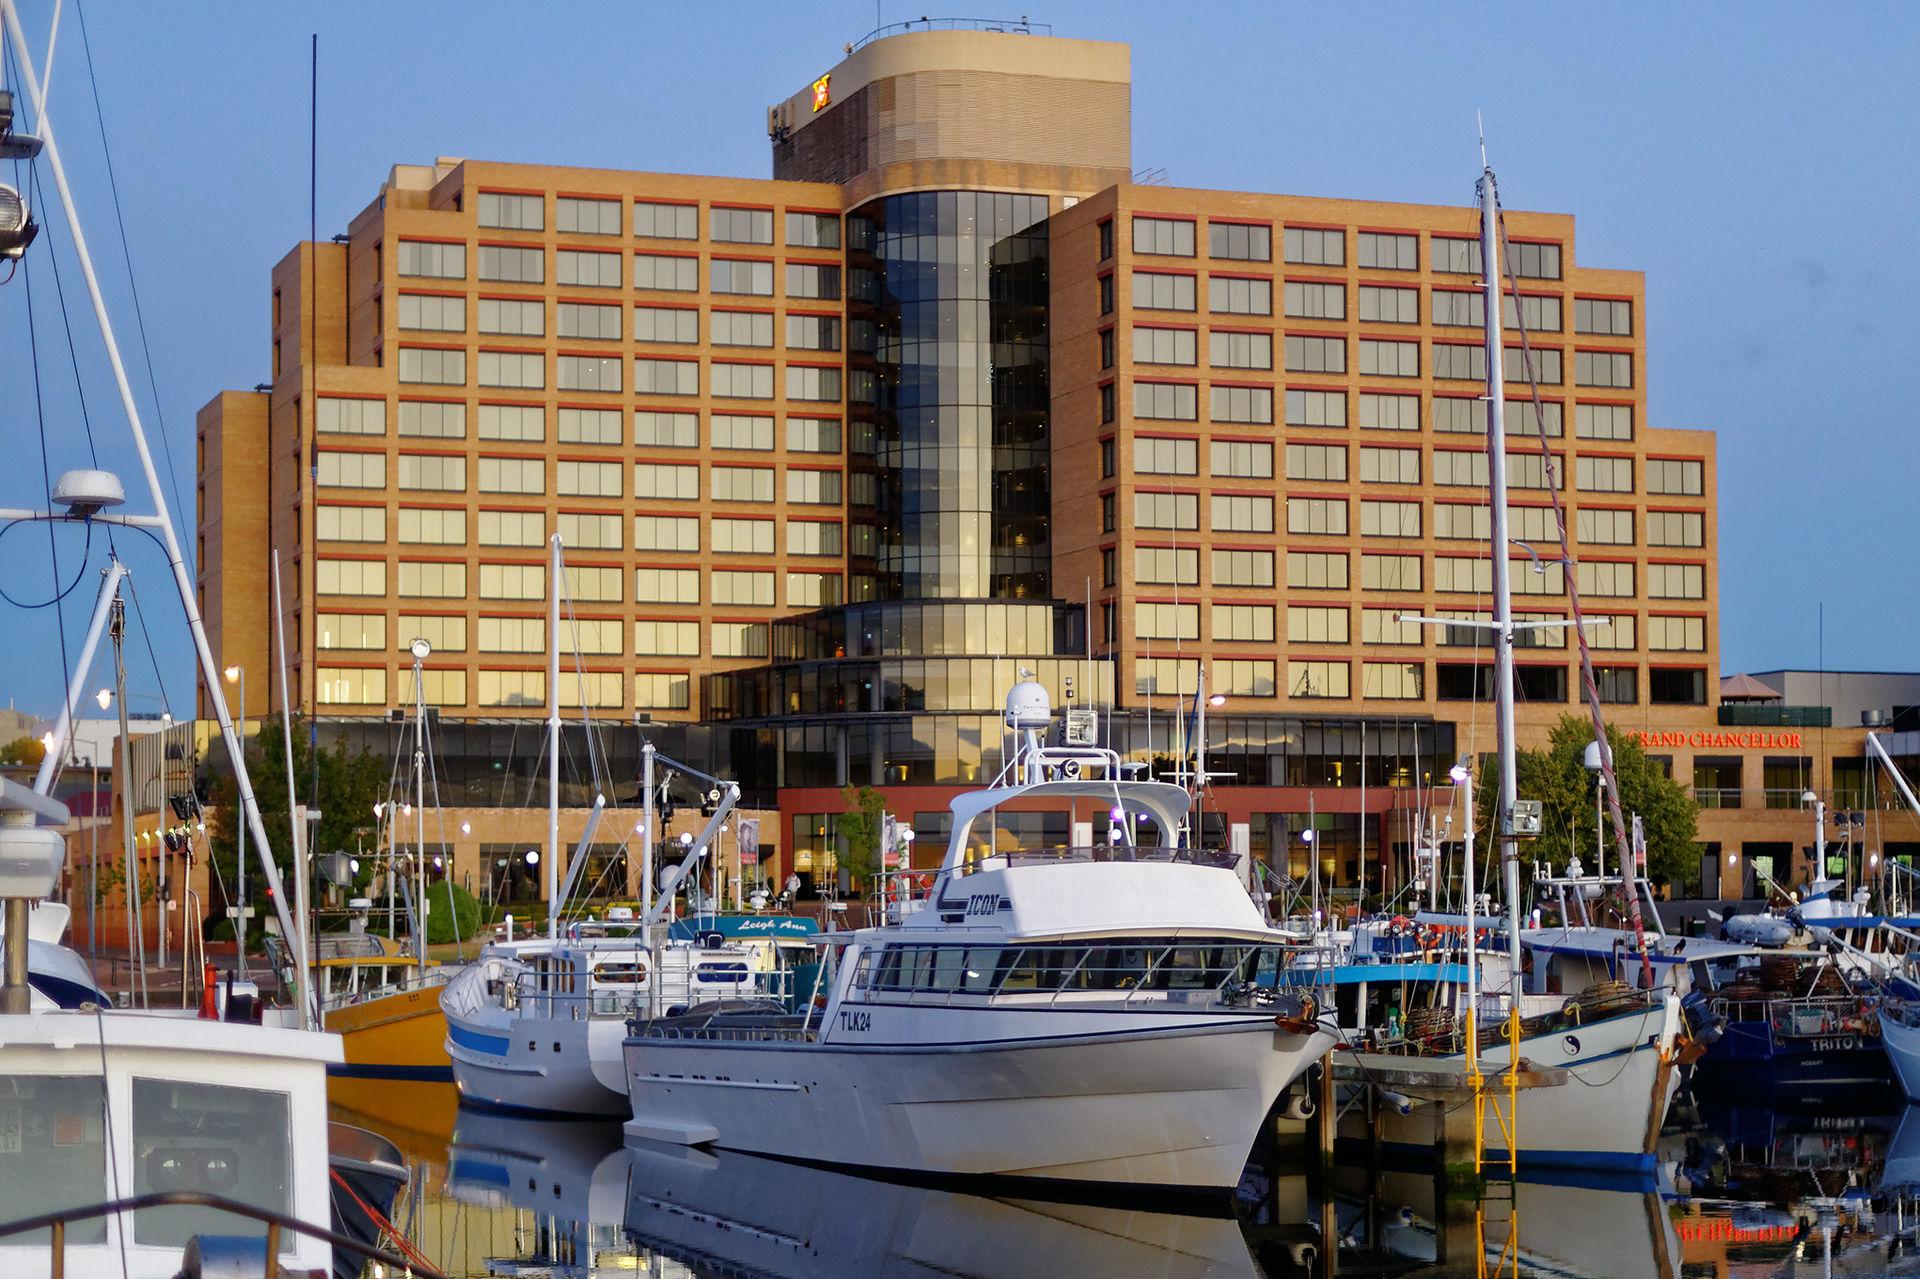 Hotel Grand Chancellor Adelaide Restaurant